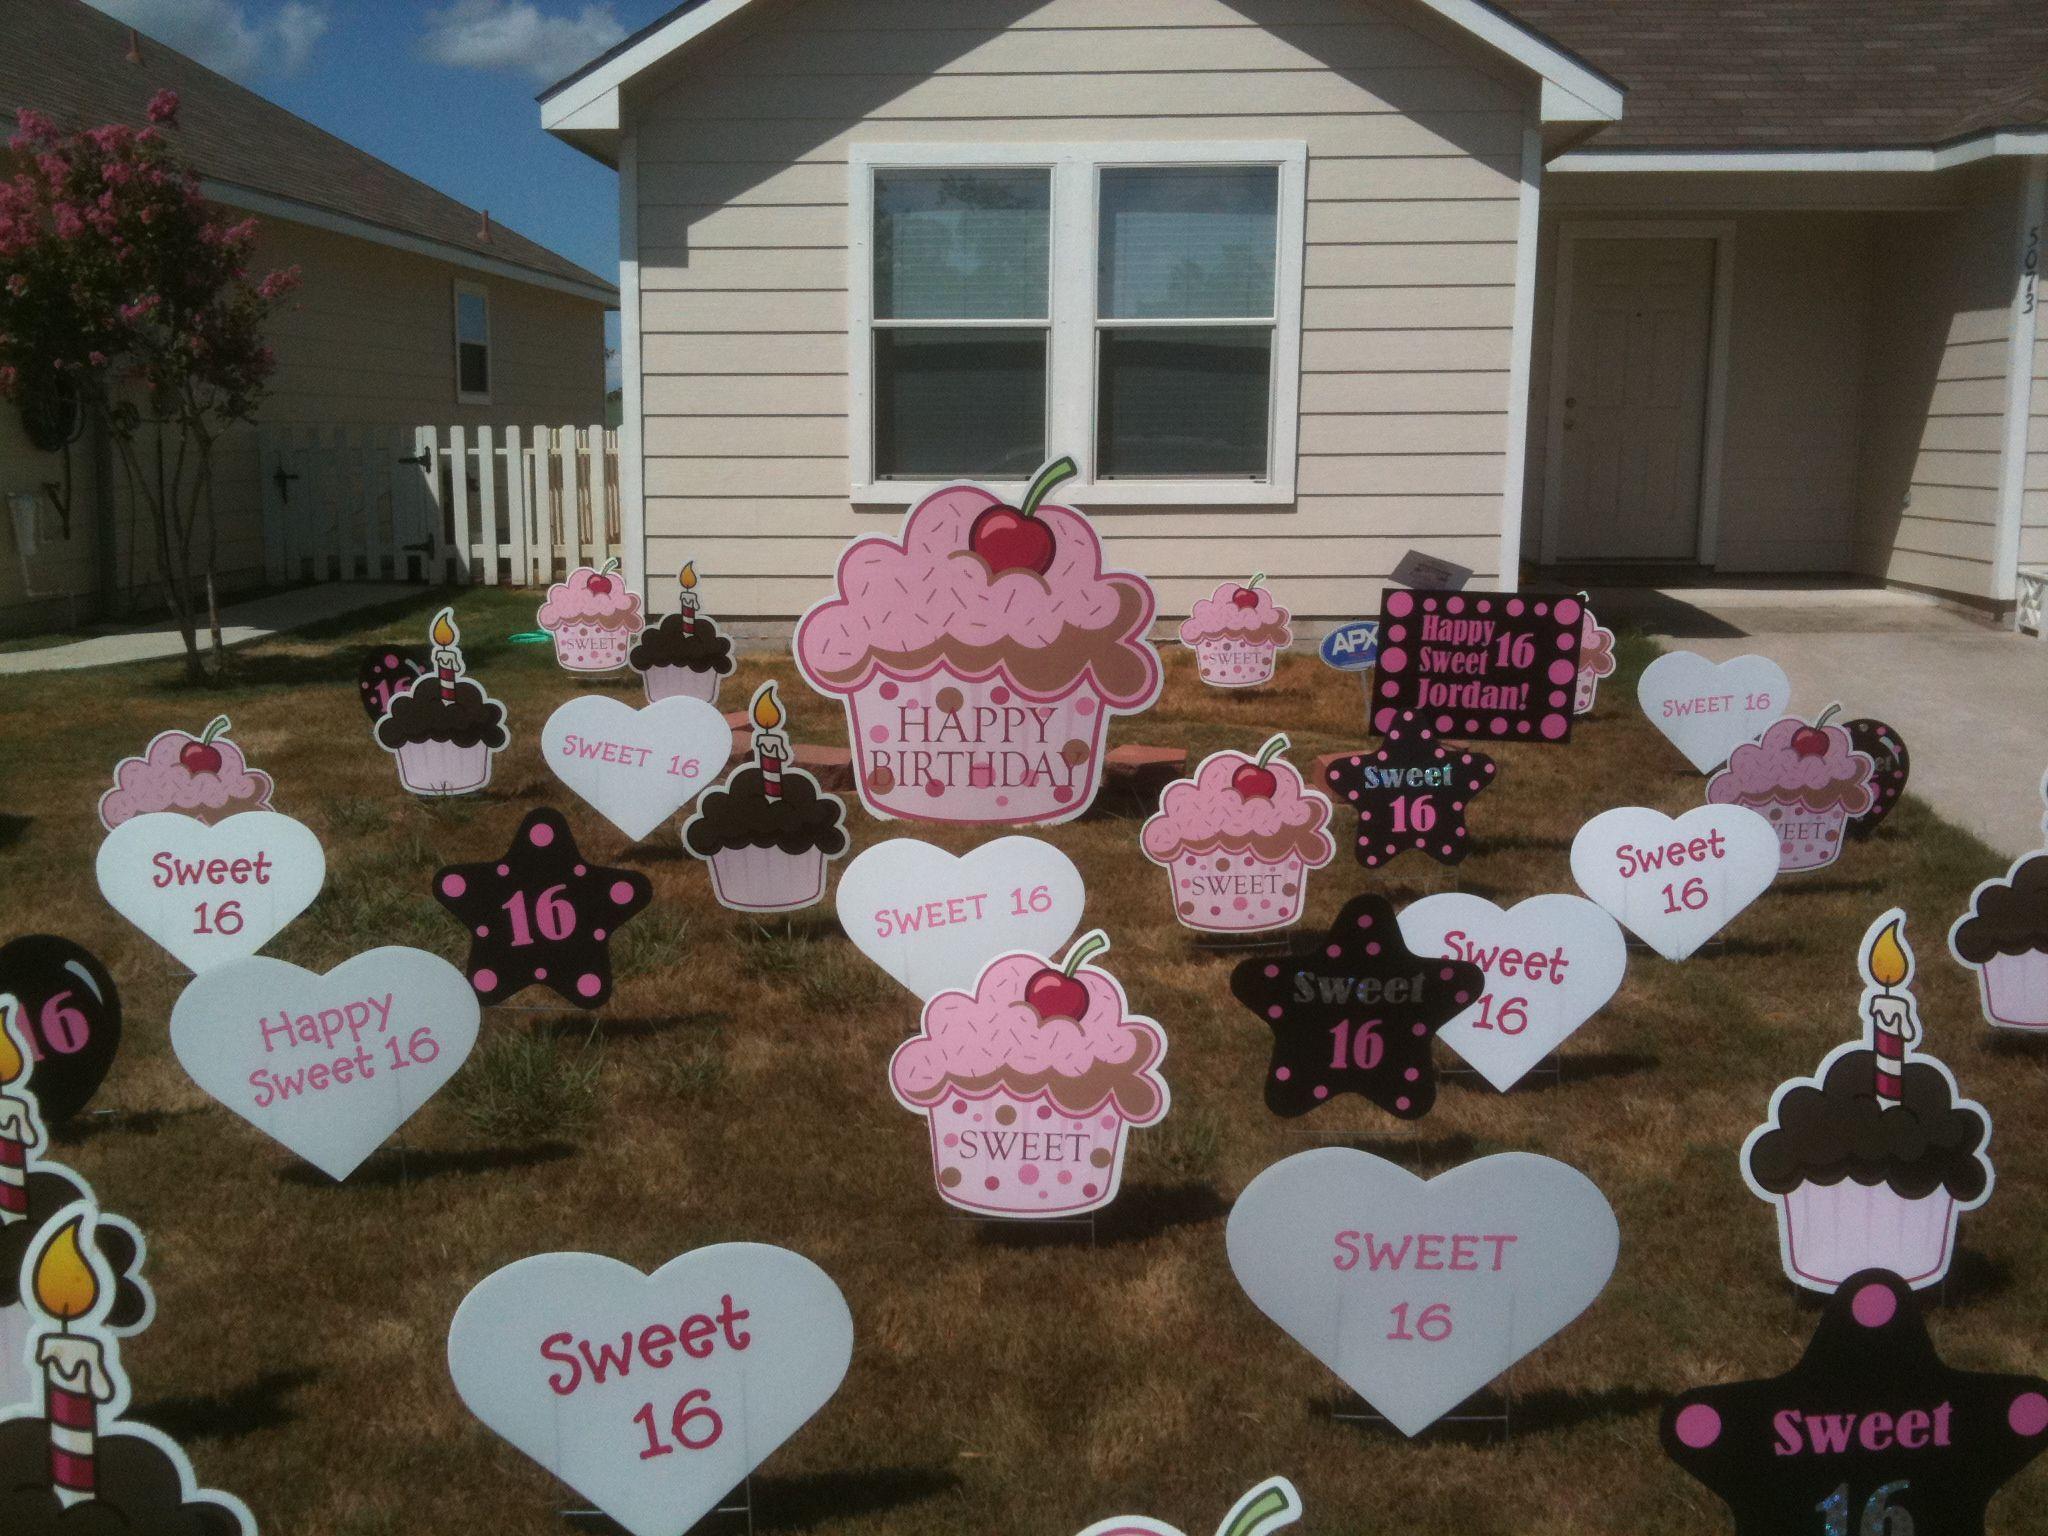 16 Birthday Lawn Signs